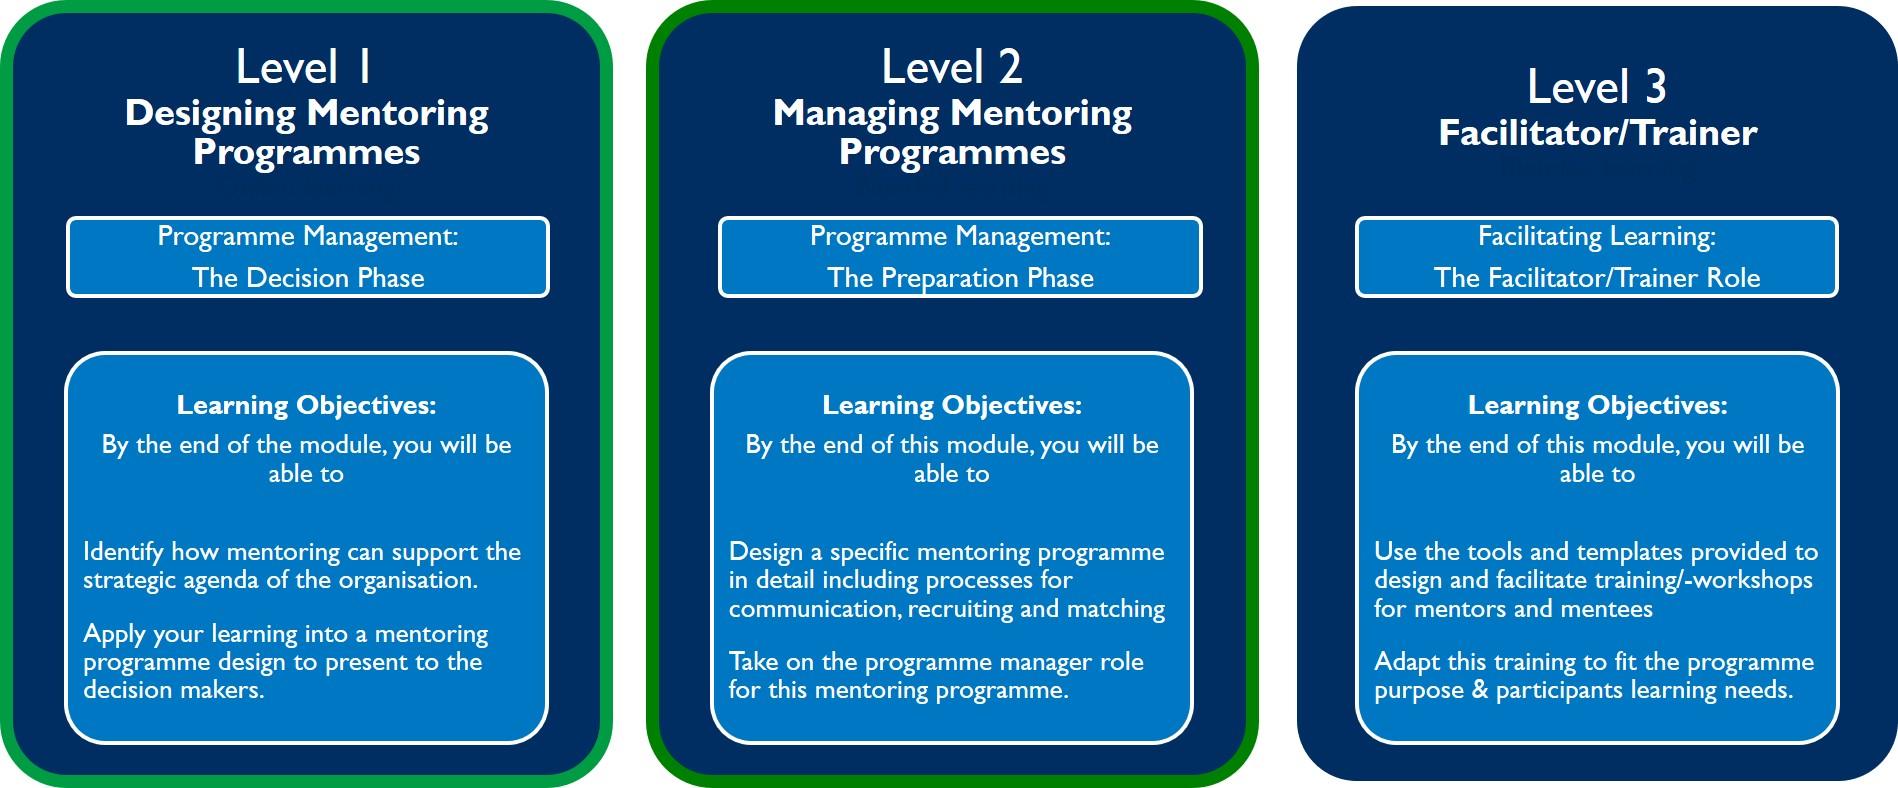 Level 2 programme